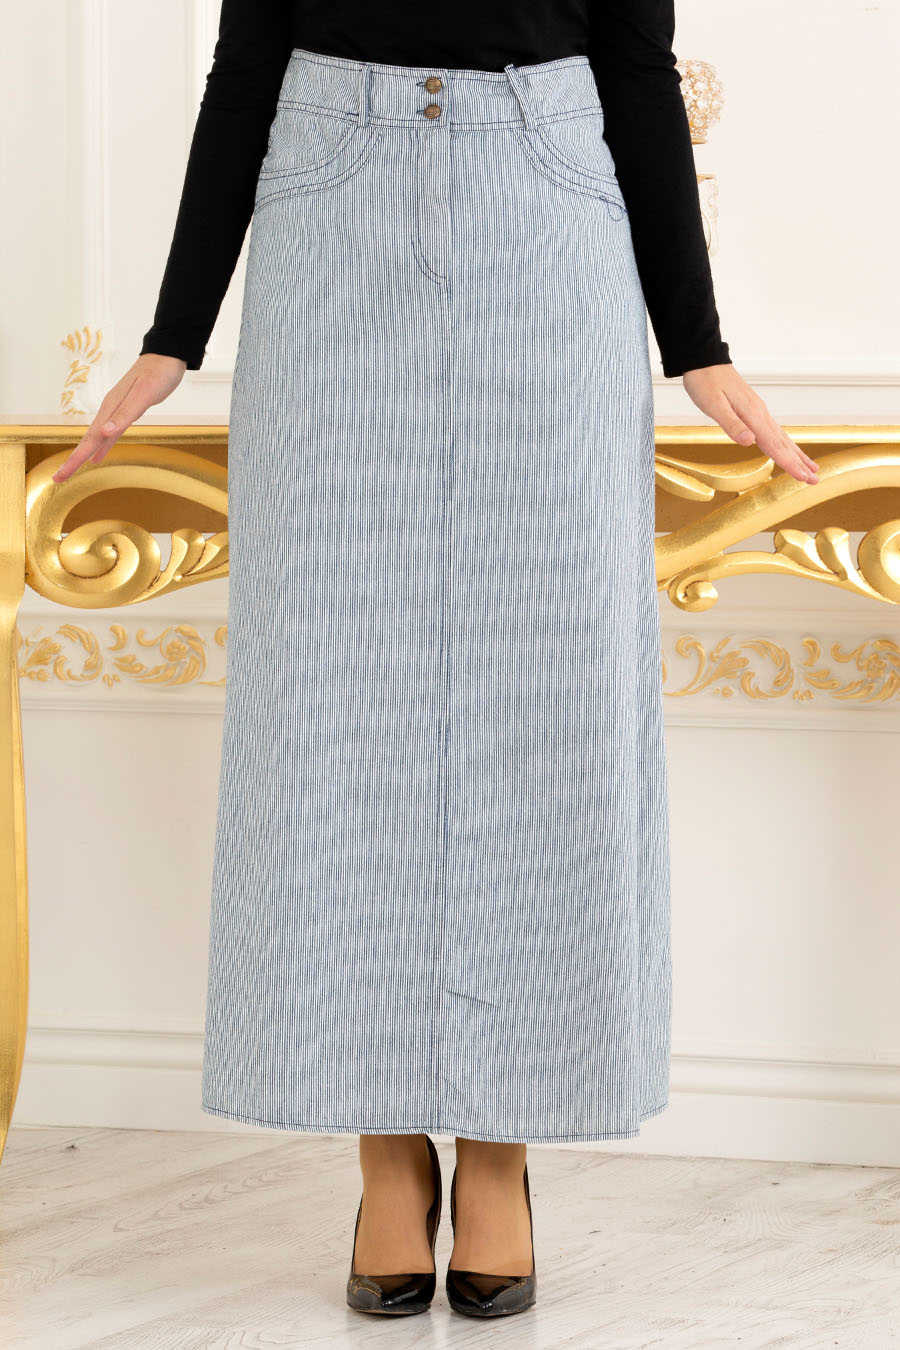 Neva Style - Navy Blue Hijab Skirt 30202L